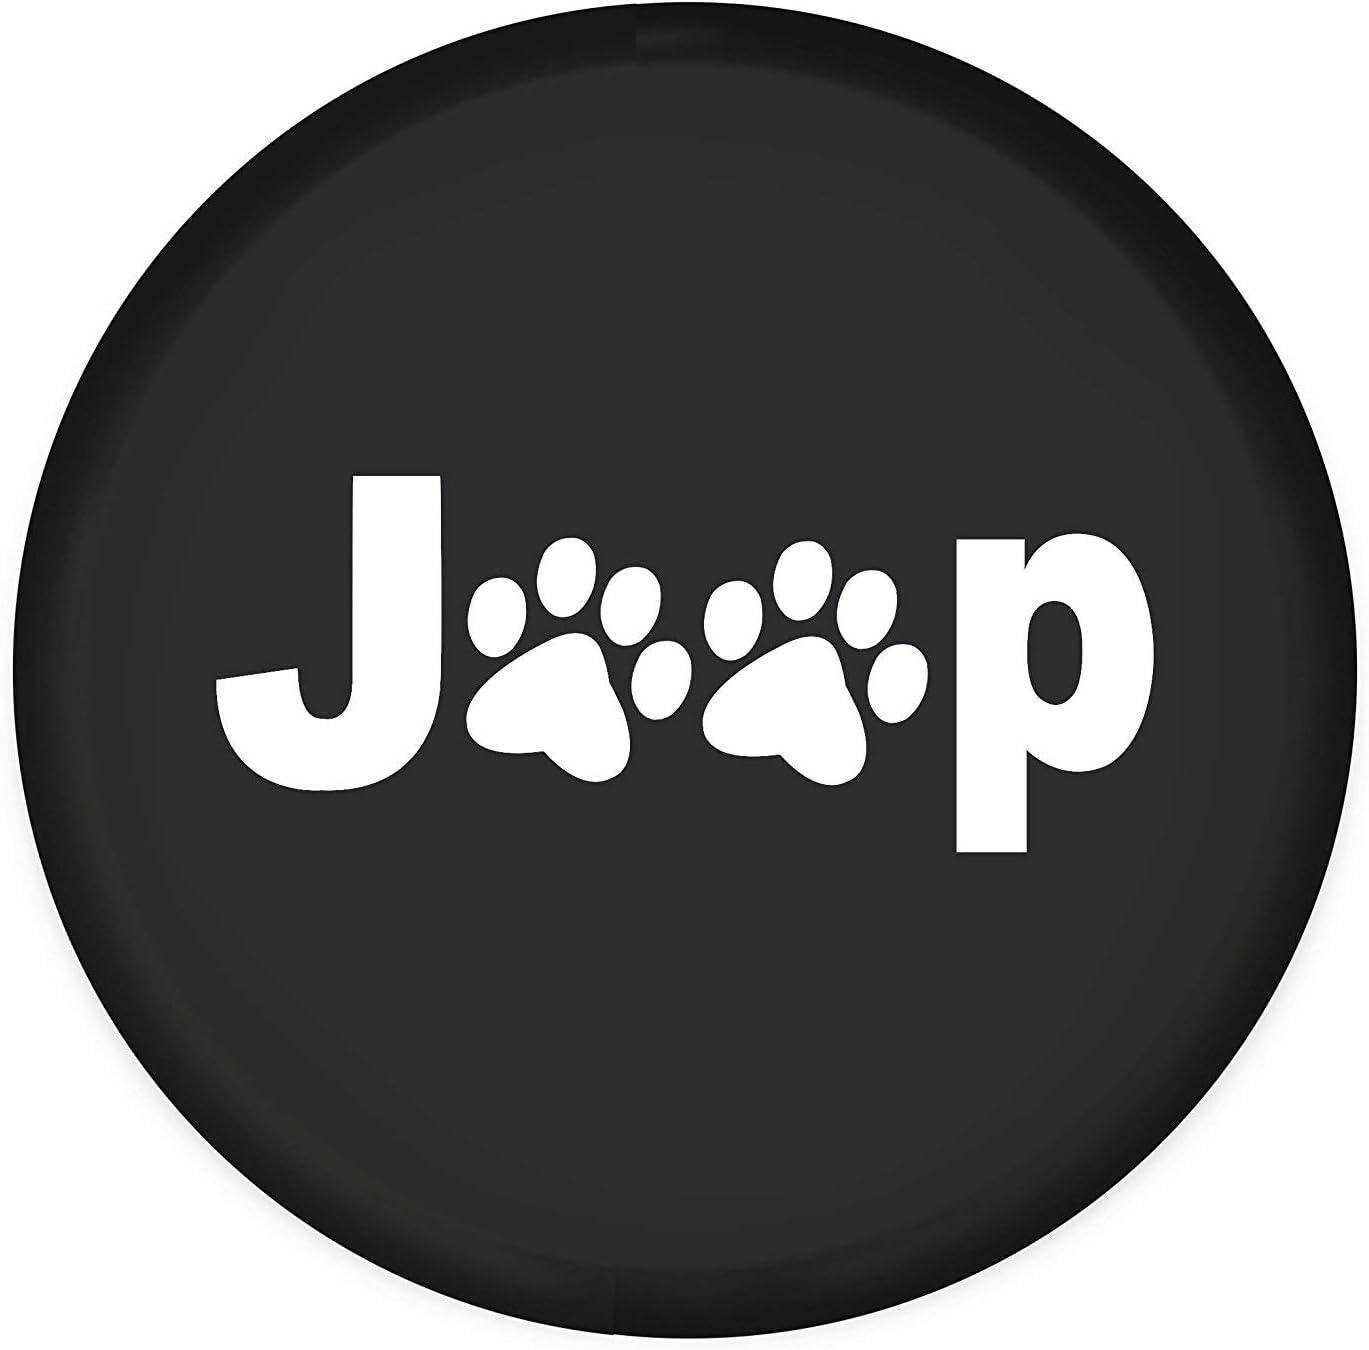 White Dog Paws, Diameter 25.98-26.77 Minisoo Spare Tire Cover,Wheel Protectors,Dog Cat Paw Print,Weatherproof Vinyl Leather,for Jeep Wrangler Sahara,Hummer H3,Toyota FJ